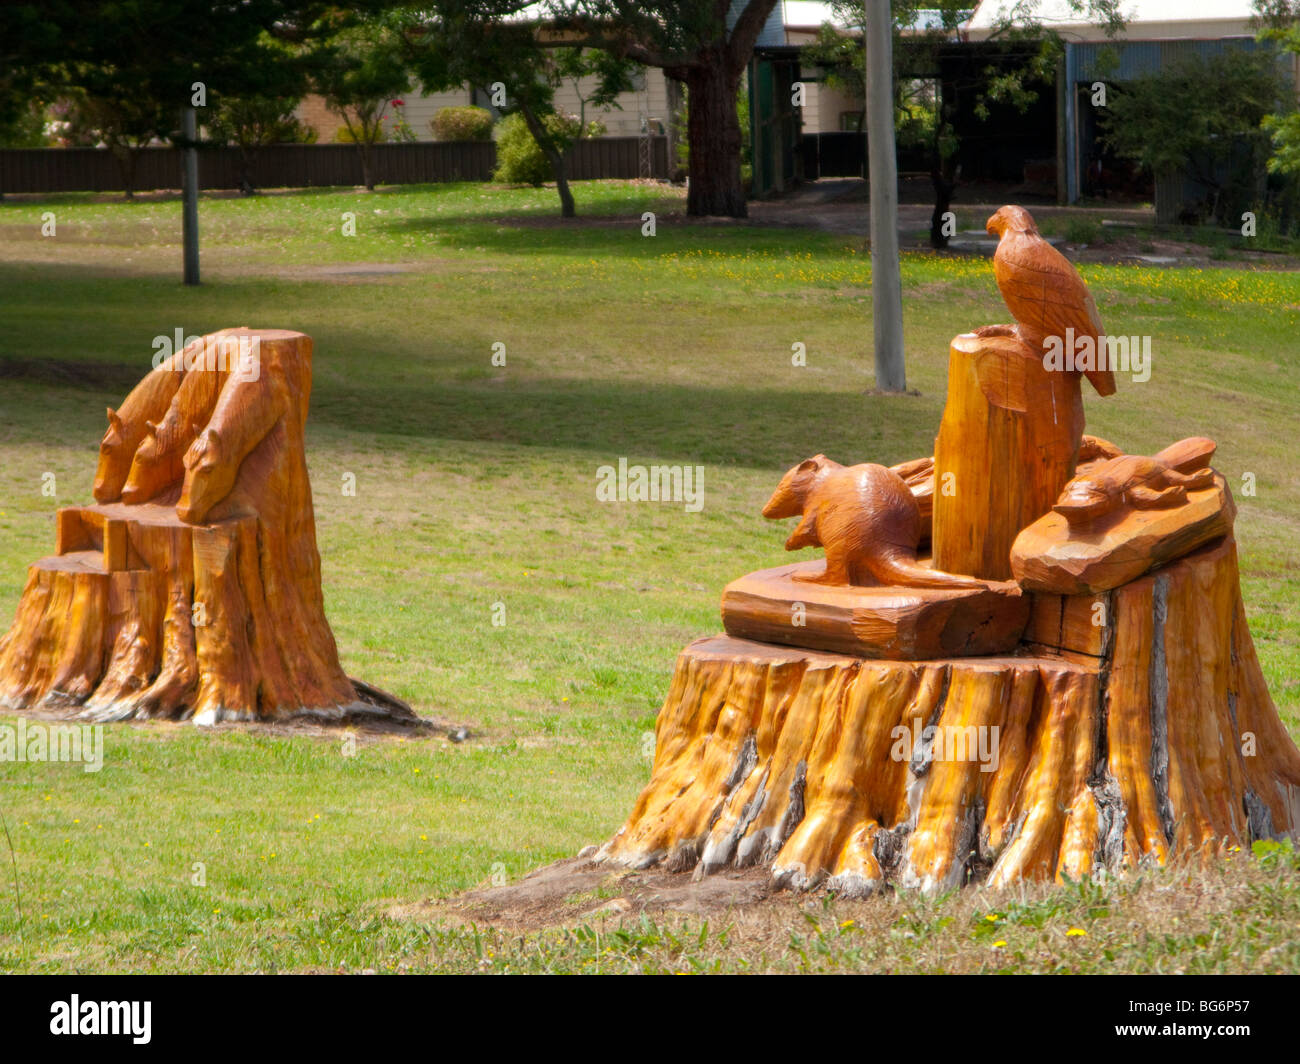 Fairytale Characters Chainsaw art at Darmoor Victoria, Australia - Stock Image